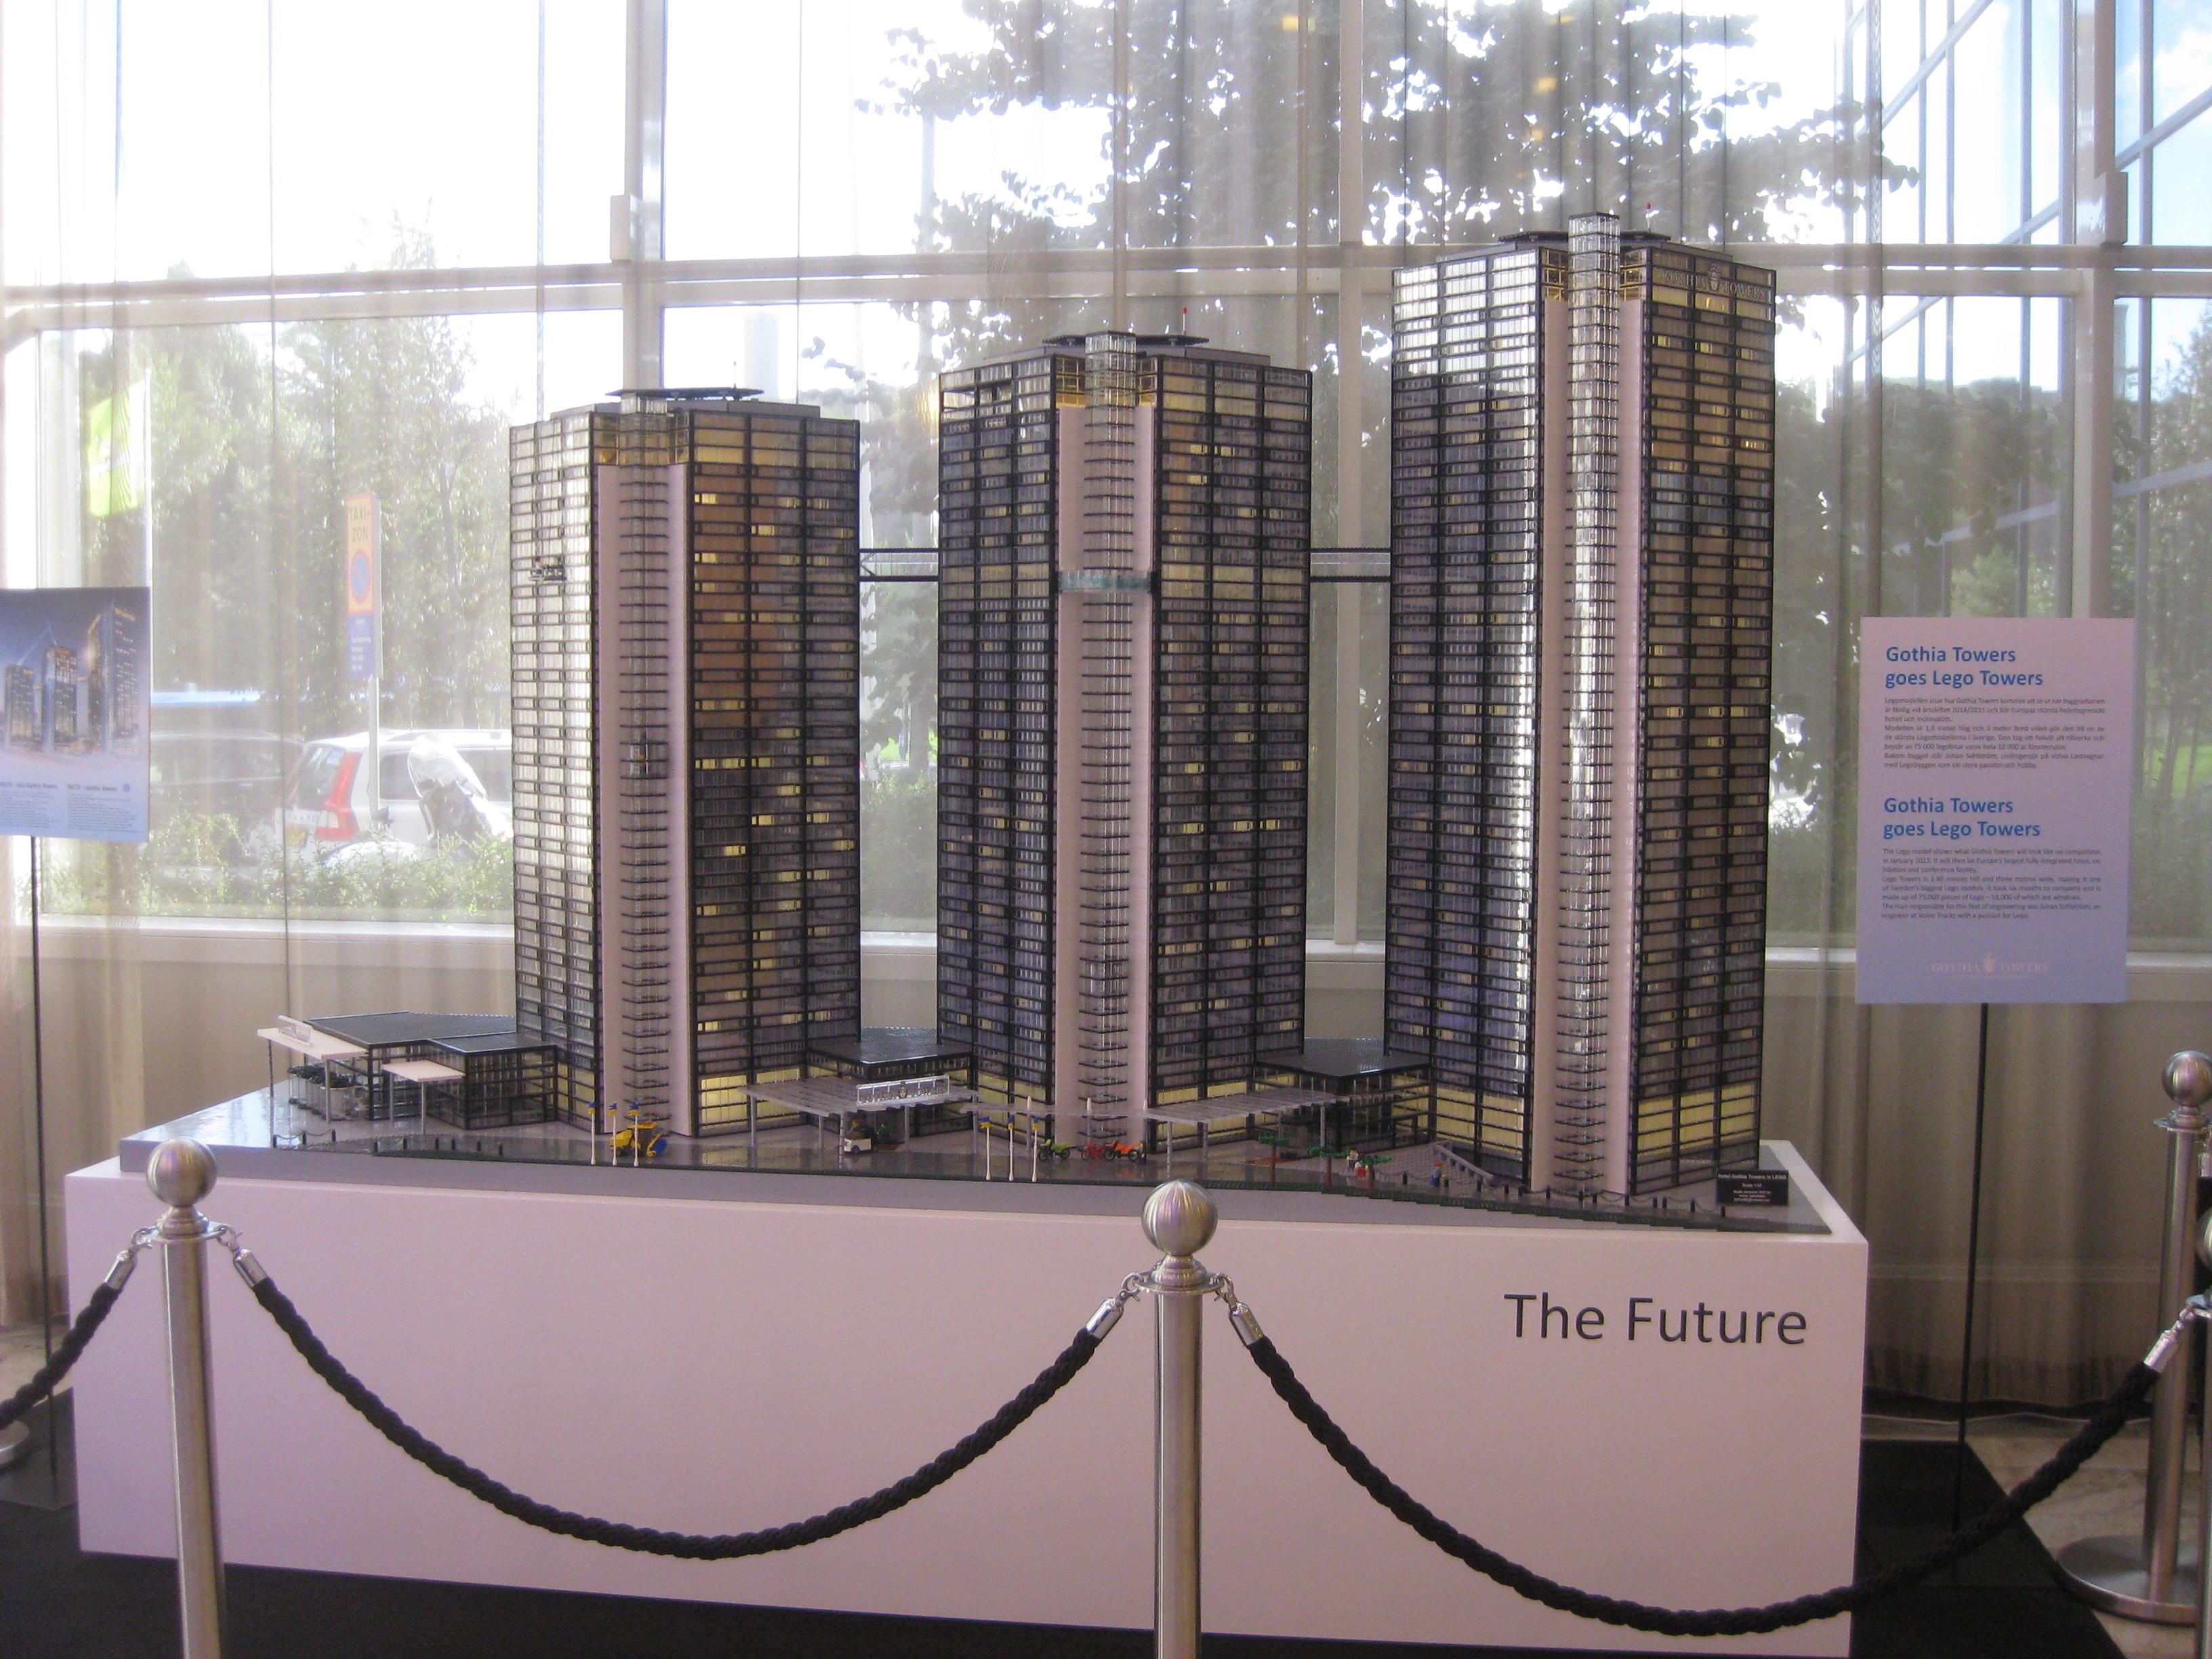 File:Gothia Towers in Lego 03.JPG - Wikimedia Commons